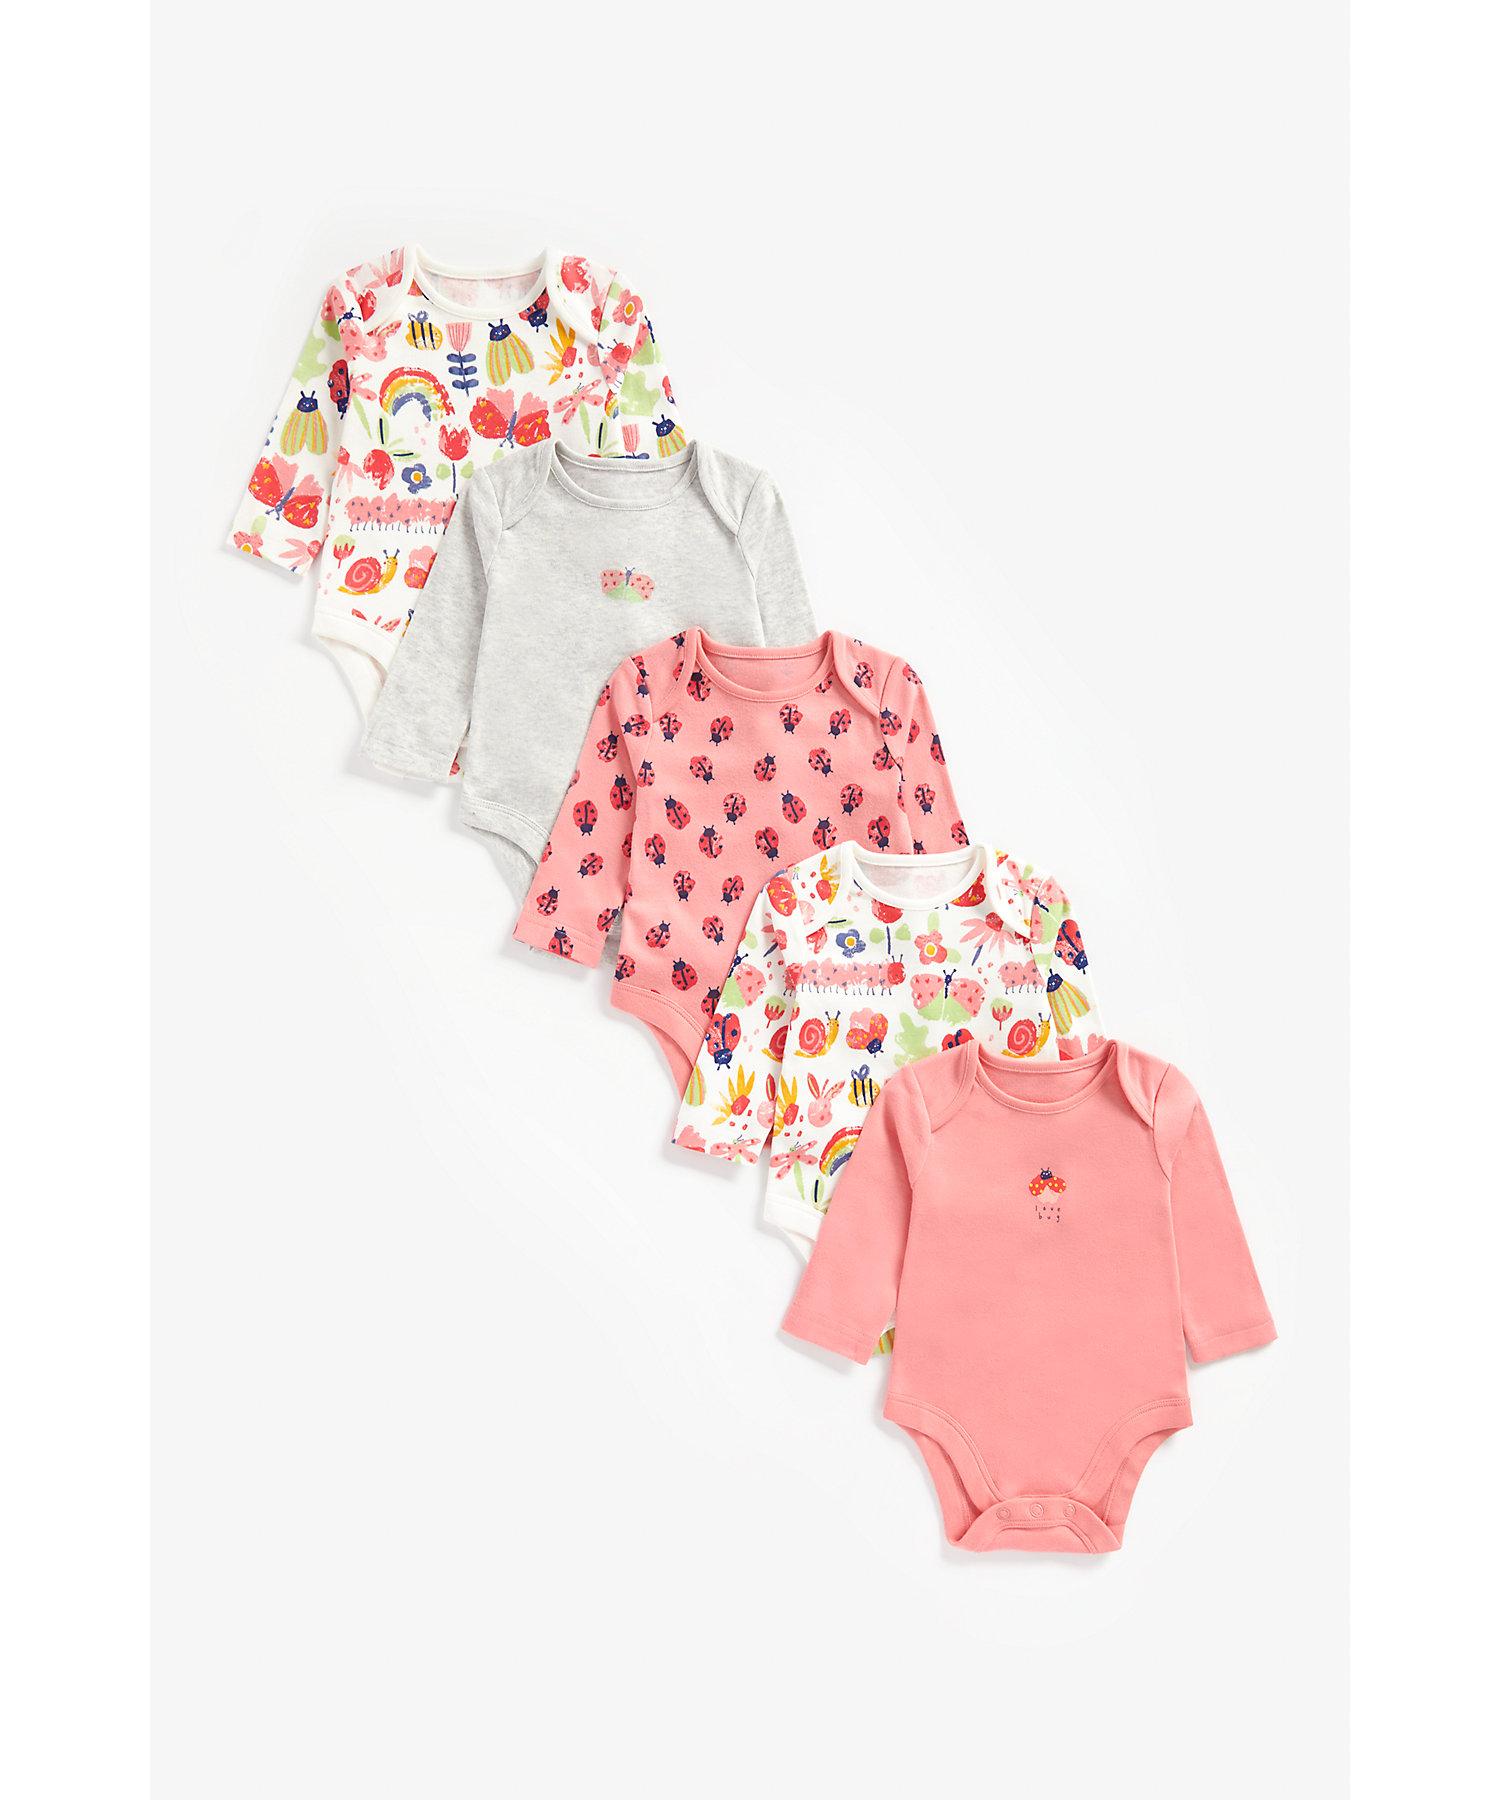 Mothercare | Girls Full Sleeves Bodysuit Bug Print - Pack Of 5 - Multicolor